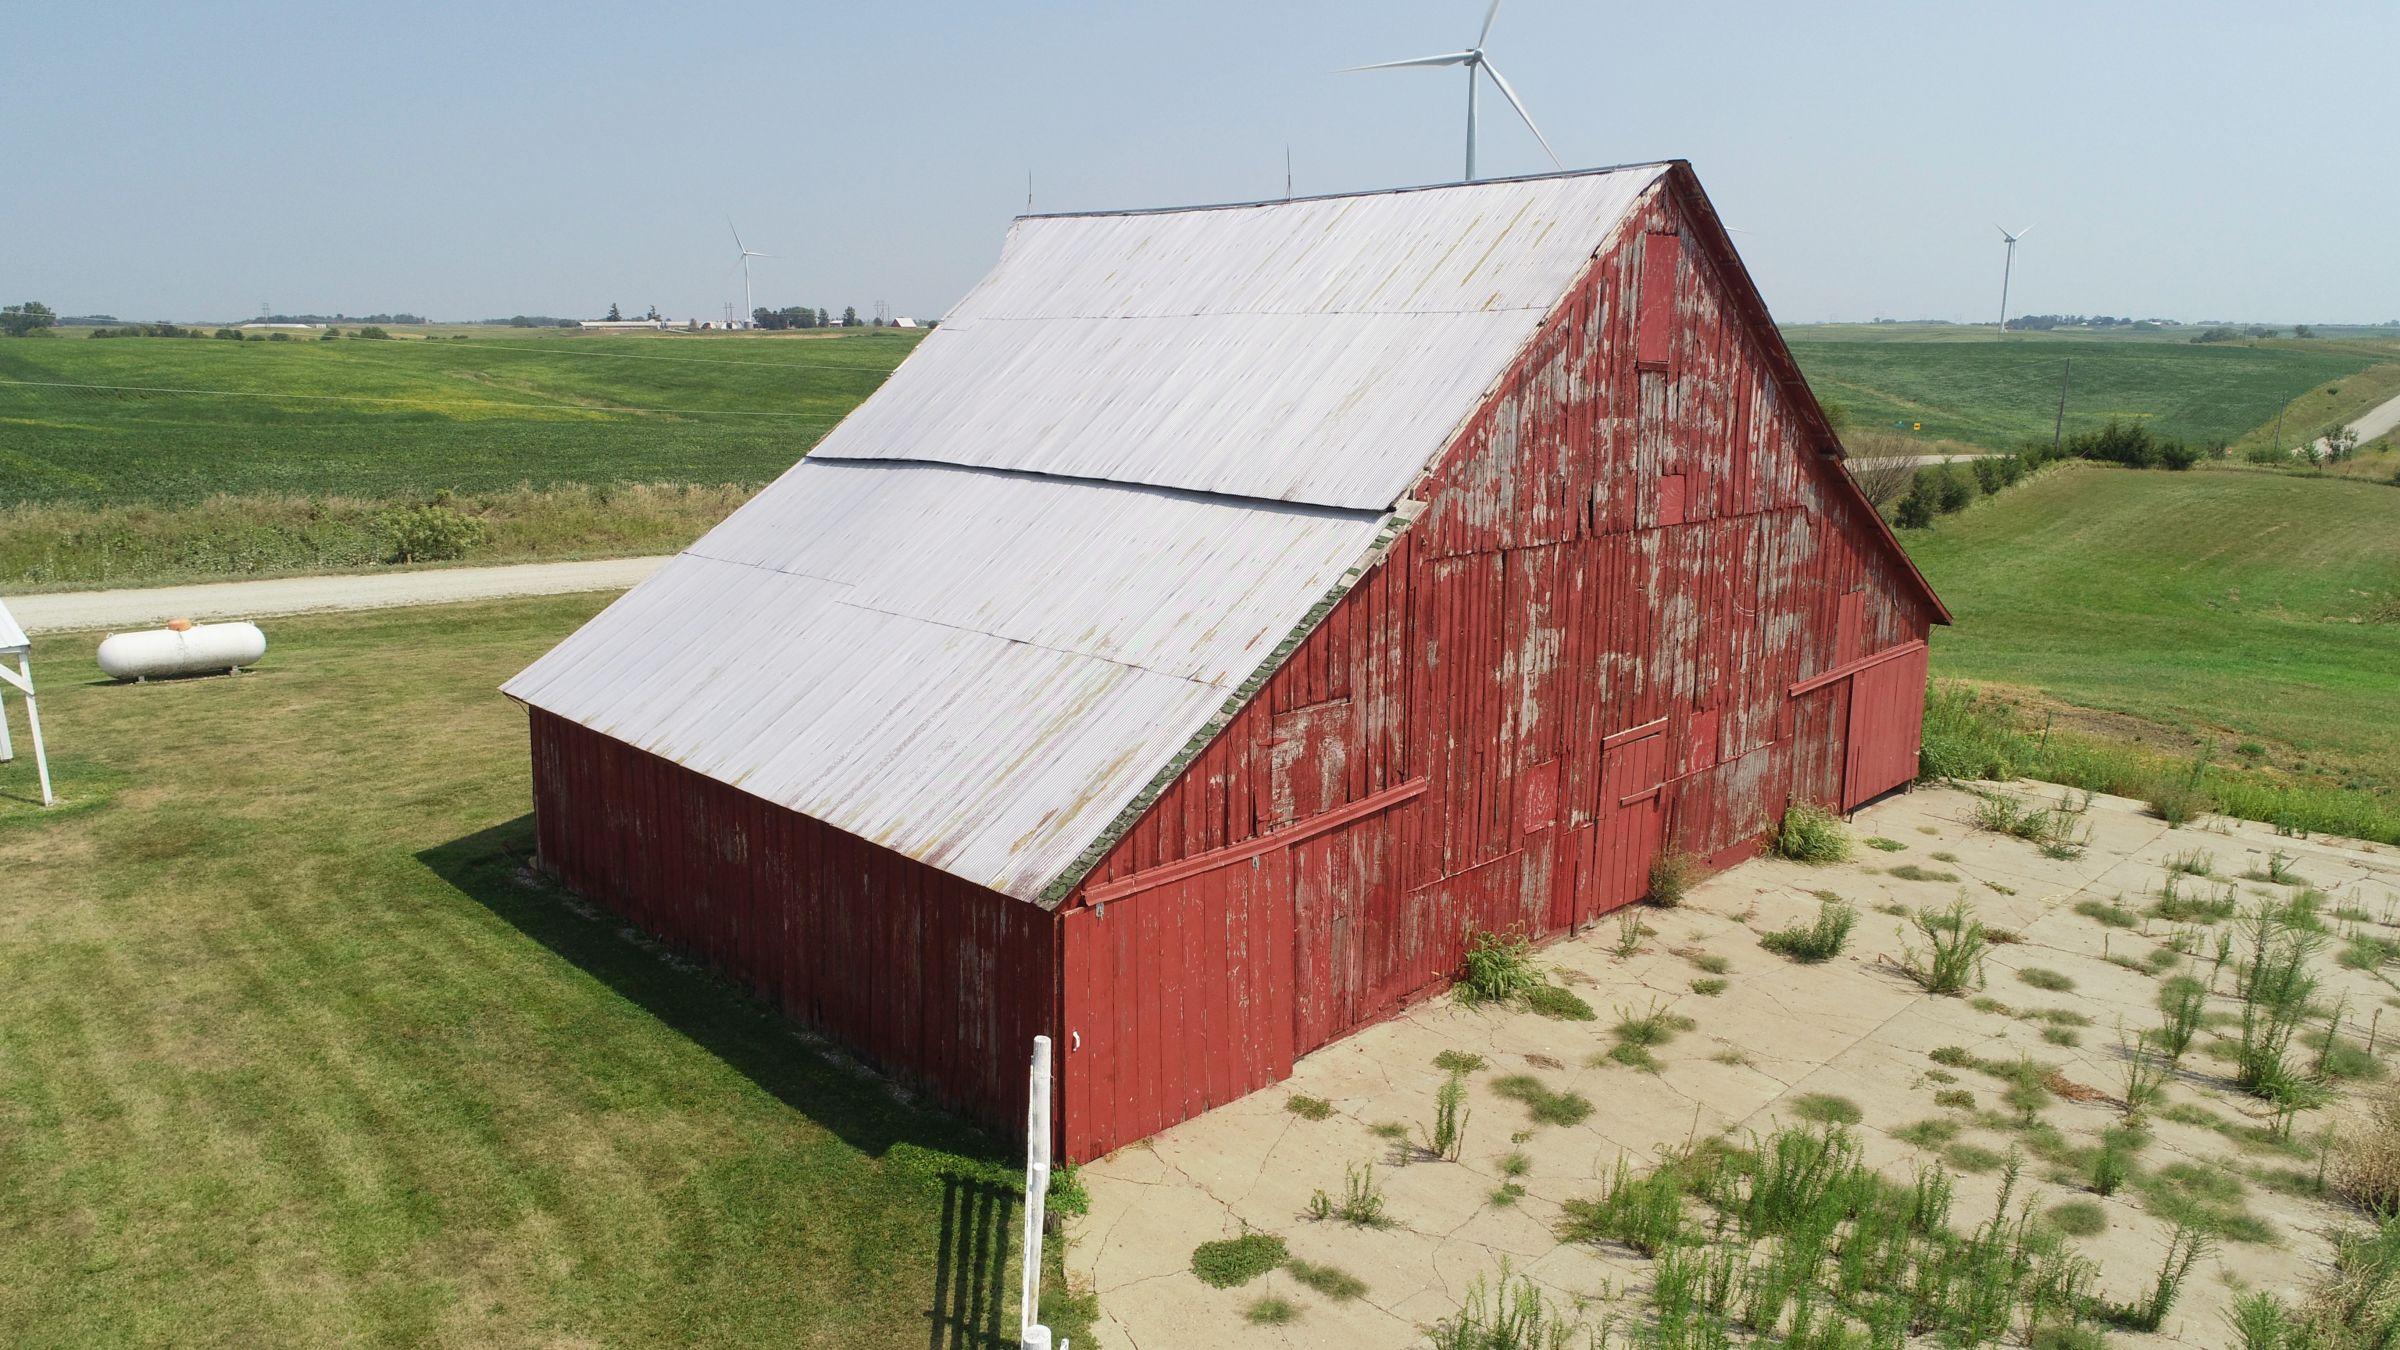 residential-land-poweshiek-county-iowa-5-acres-listing-number-15149-2-2020-08-28-201121.jpg